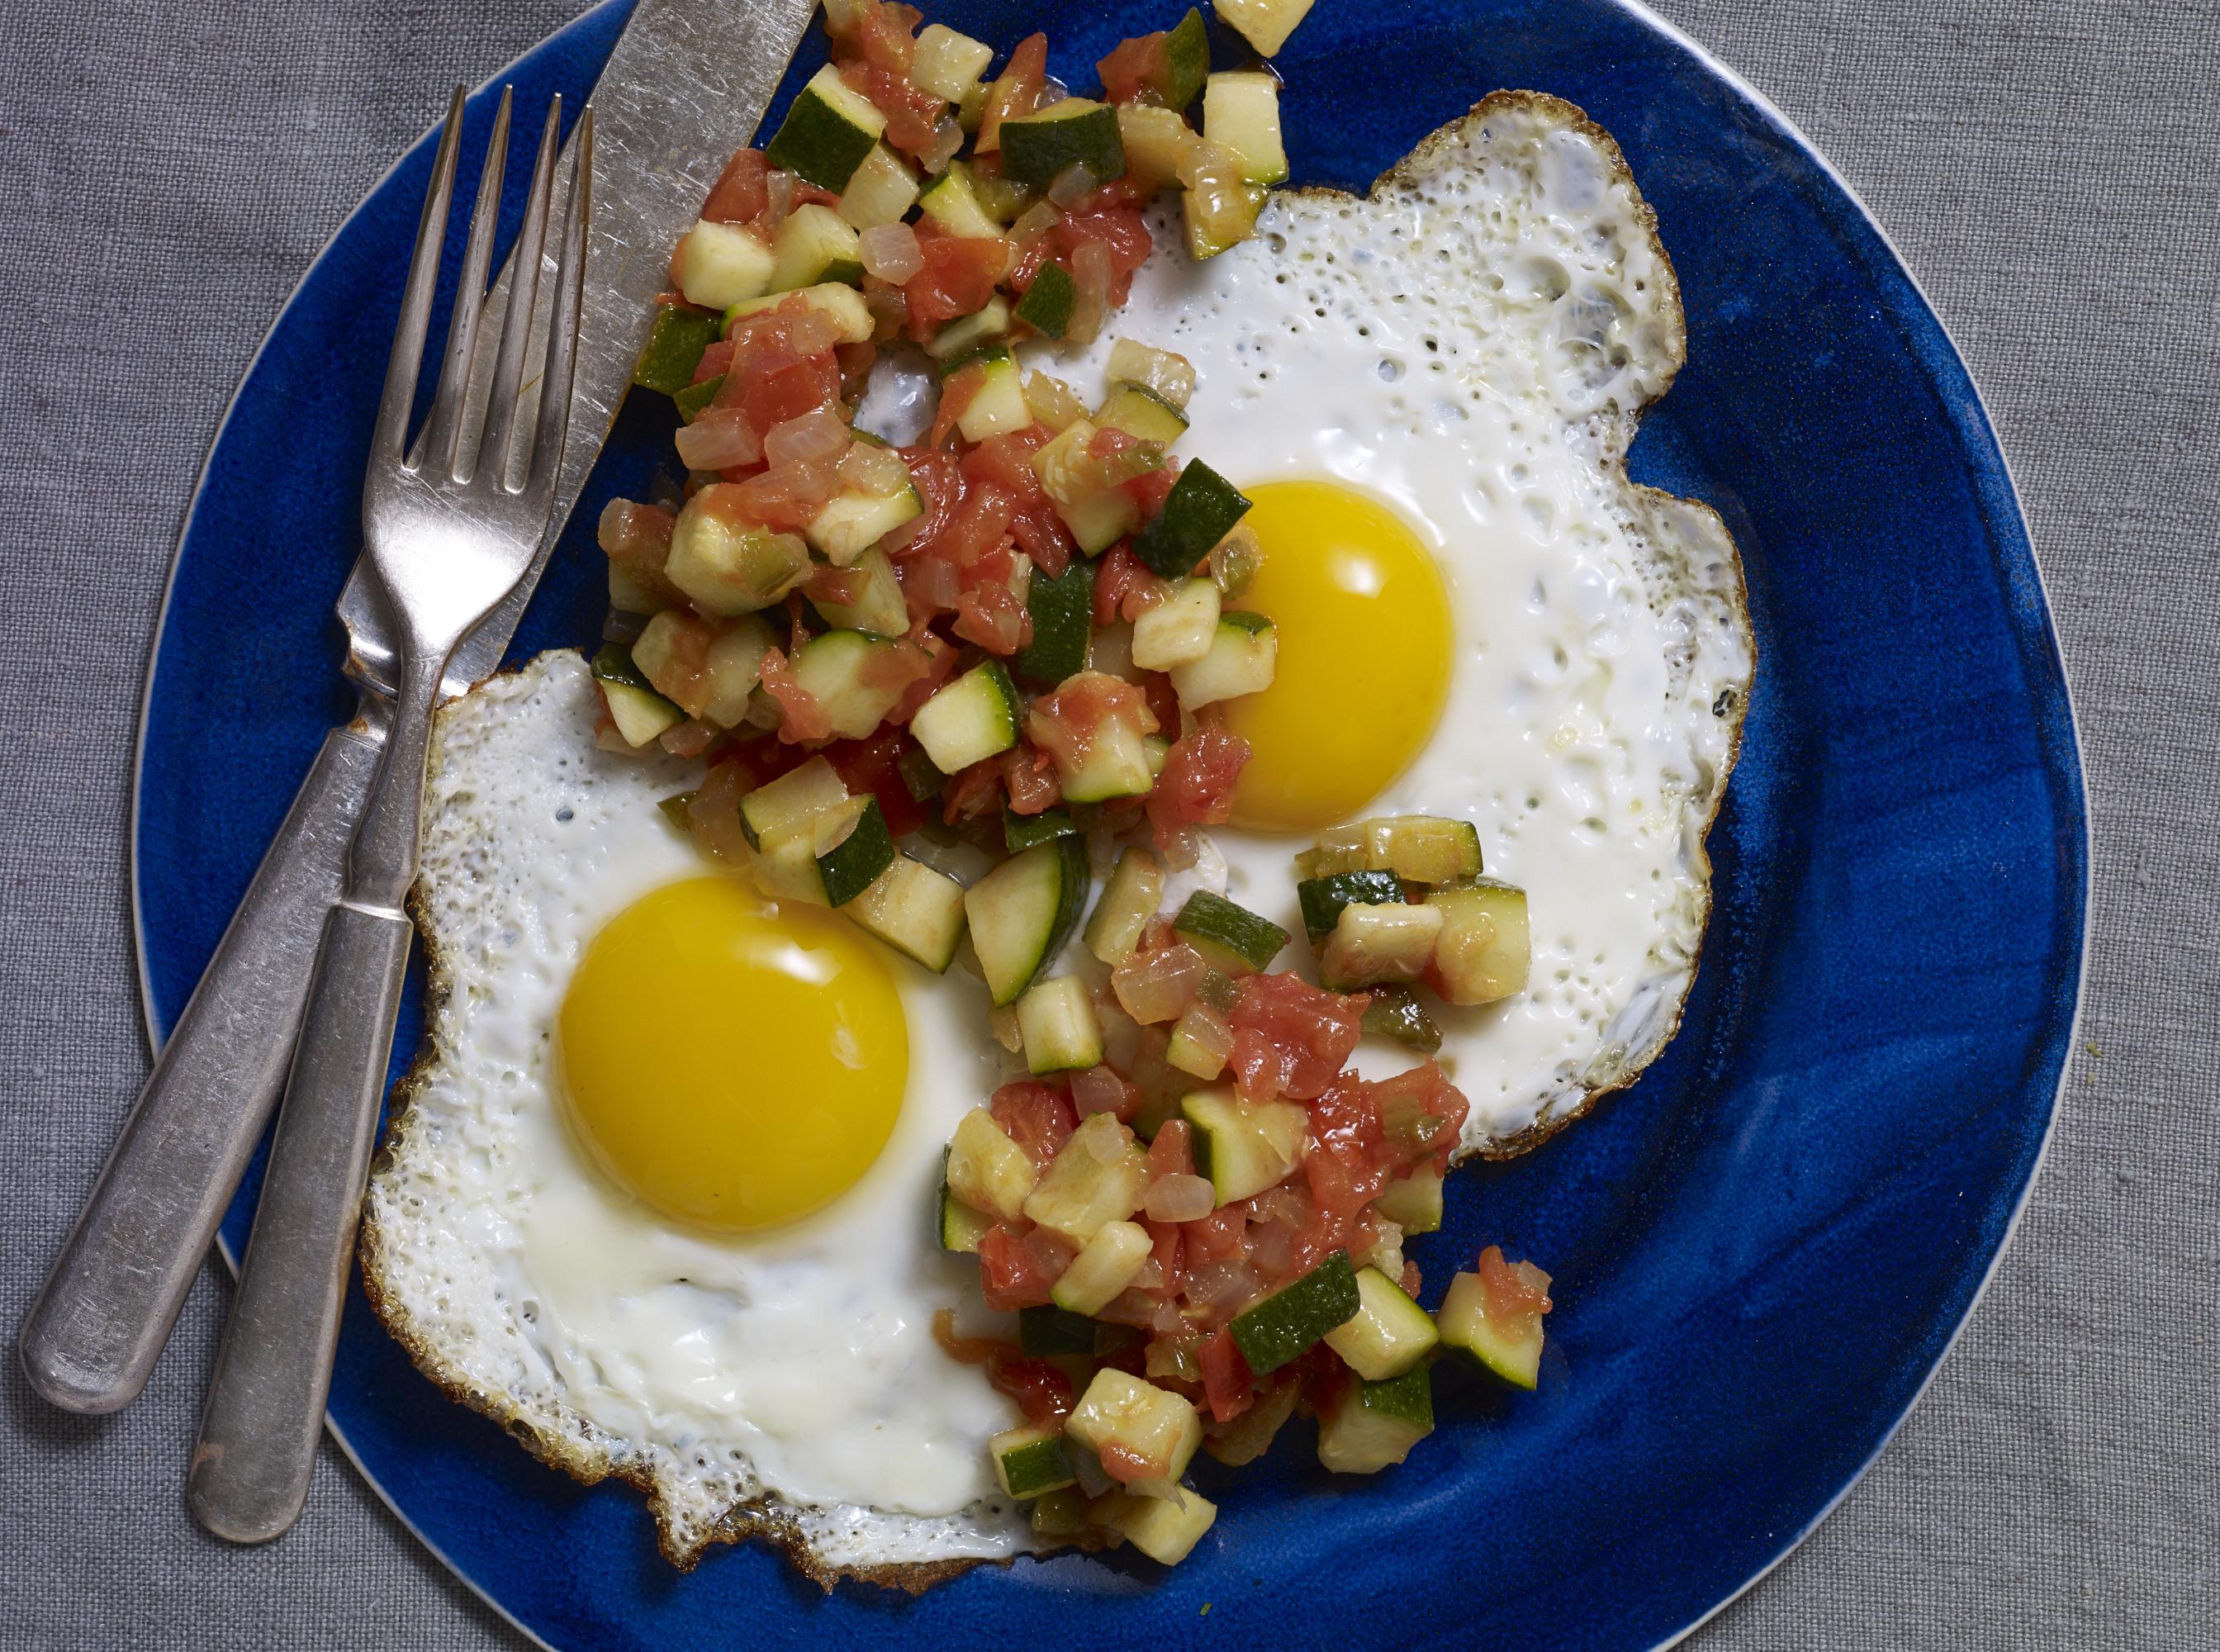 huevos rancheros with zucchini